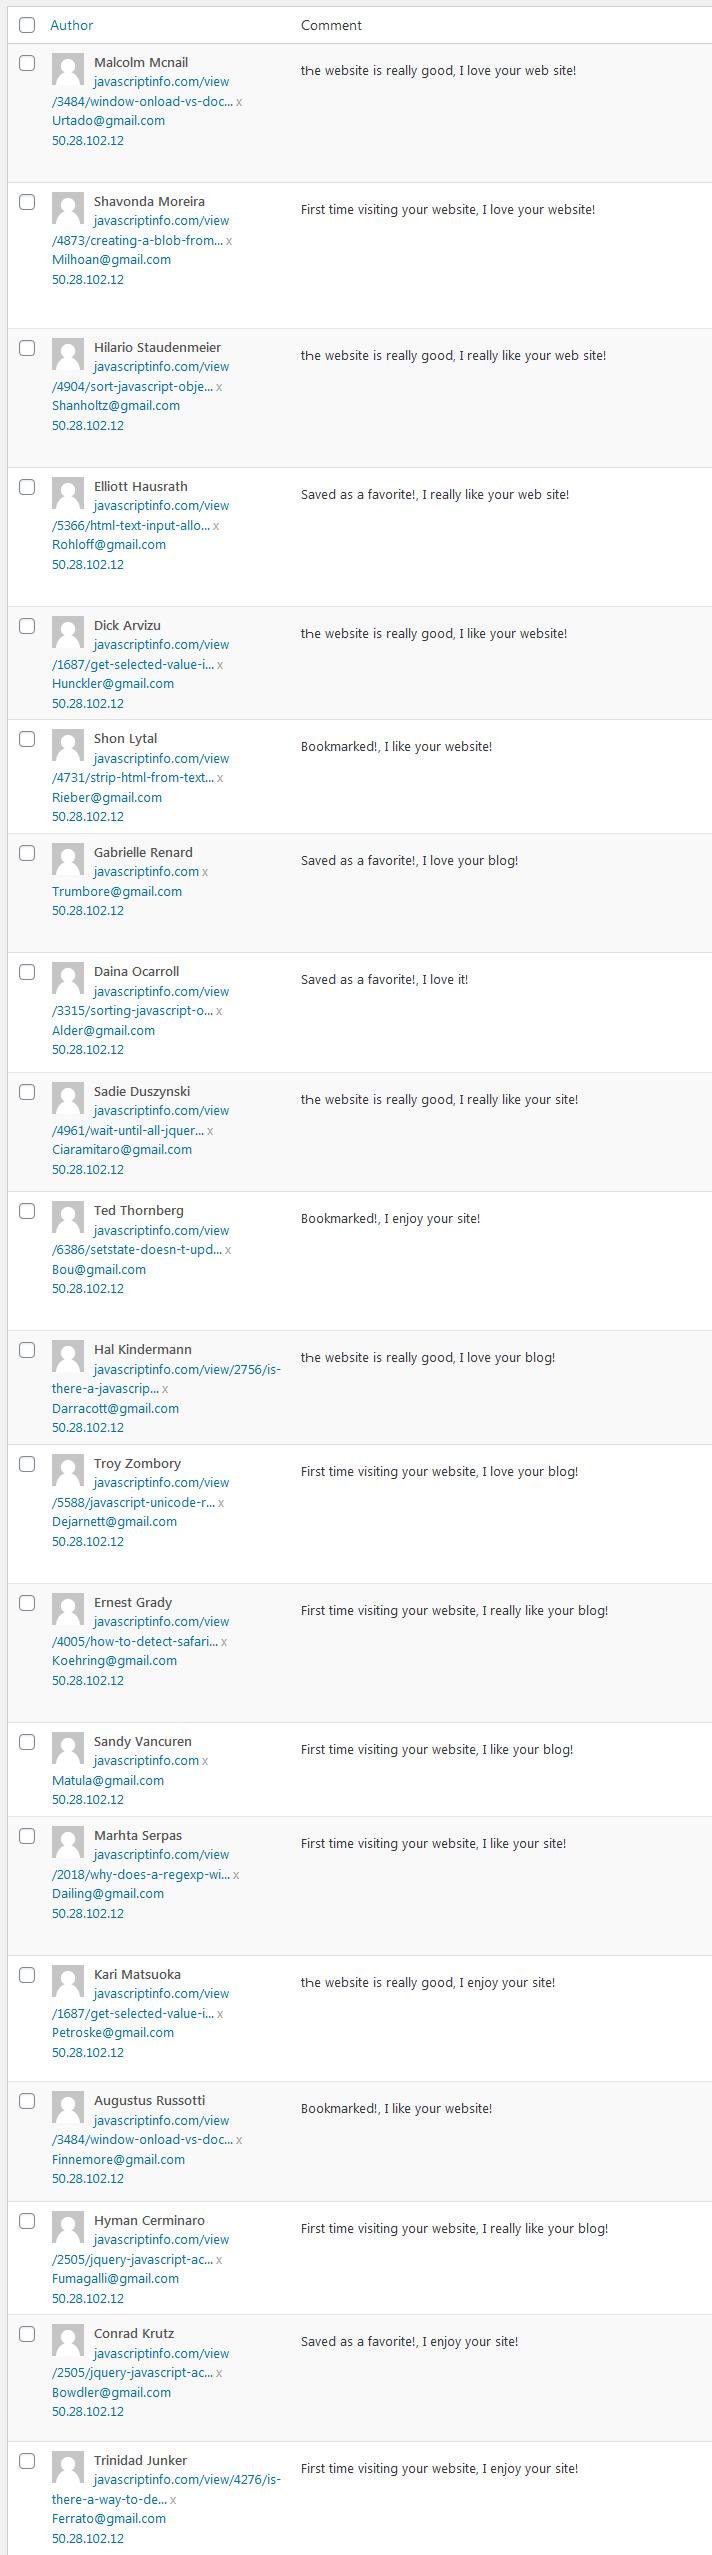 Comments_‹_devioblog_—_WordPress_-_2020-03-27_10.06.32.png